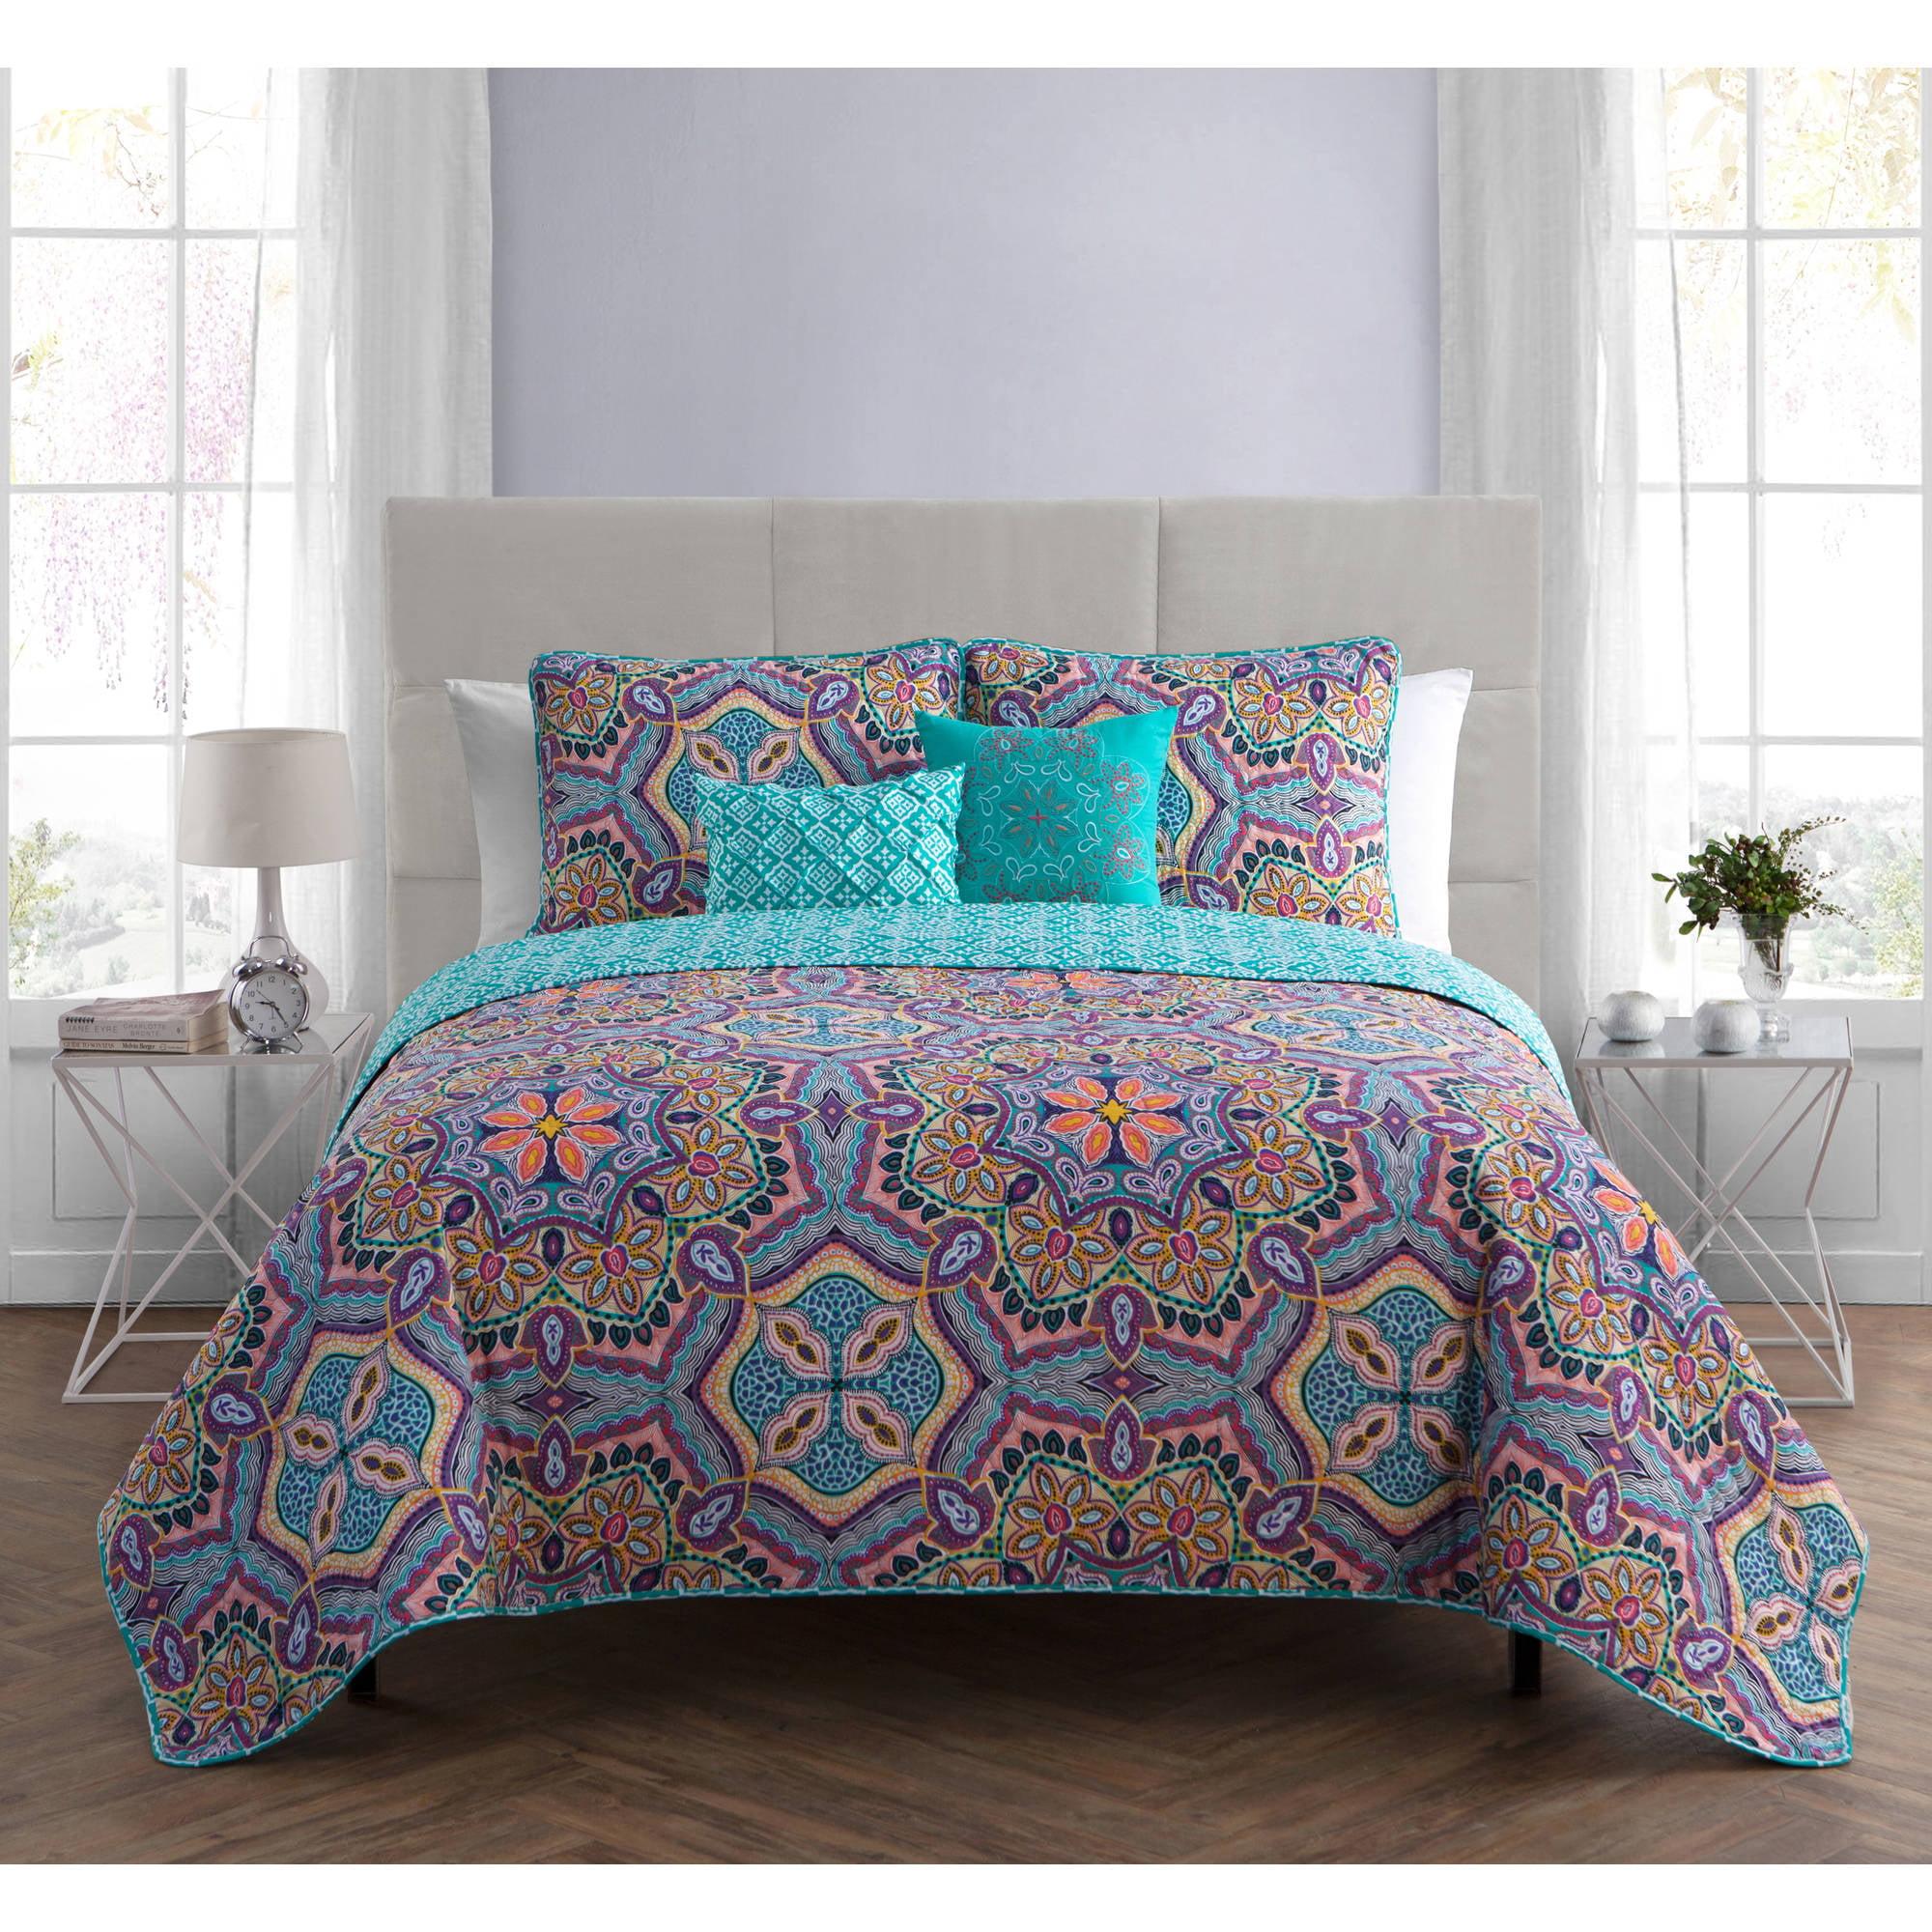 VCNY Home Yara Geometric Medallion 4/5-Piece Reversible Bedding Quilt Set, Multiple Sizes